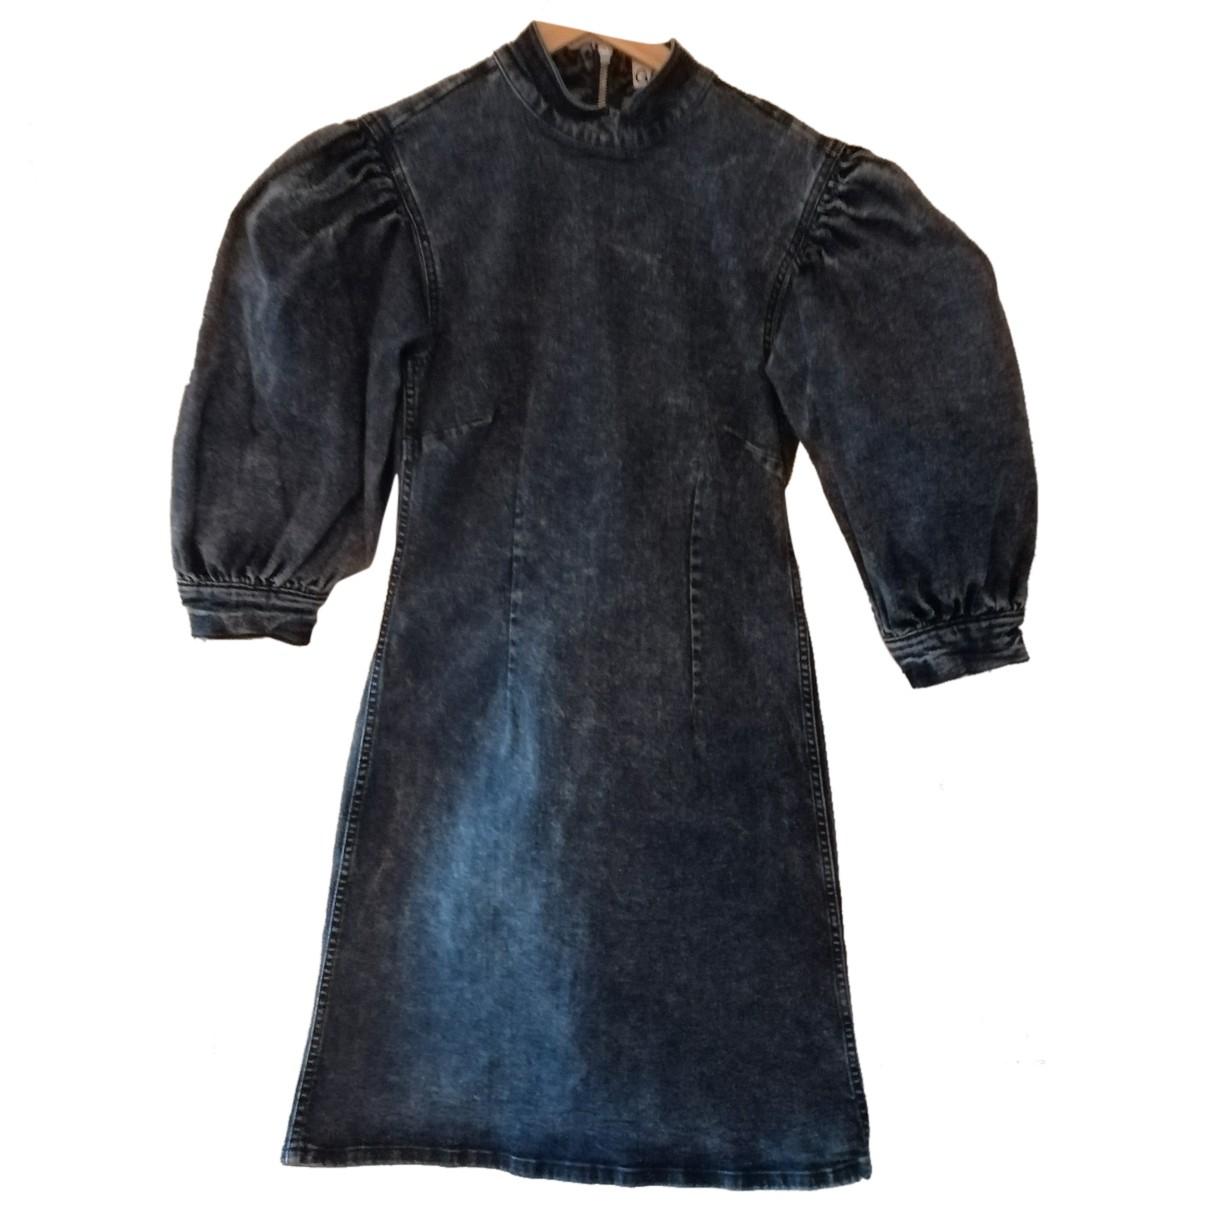 Ganni - Robe Spring Summer 2019 pour femme en denim - bleu